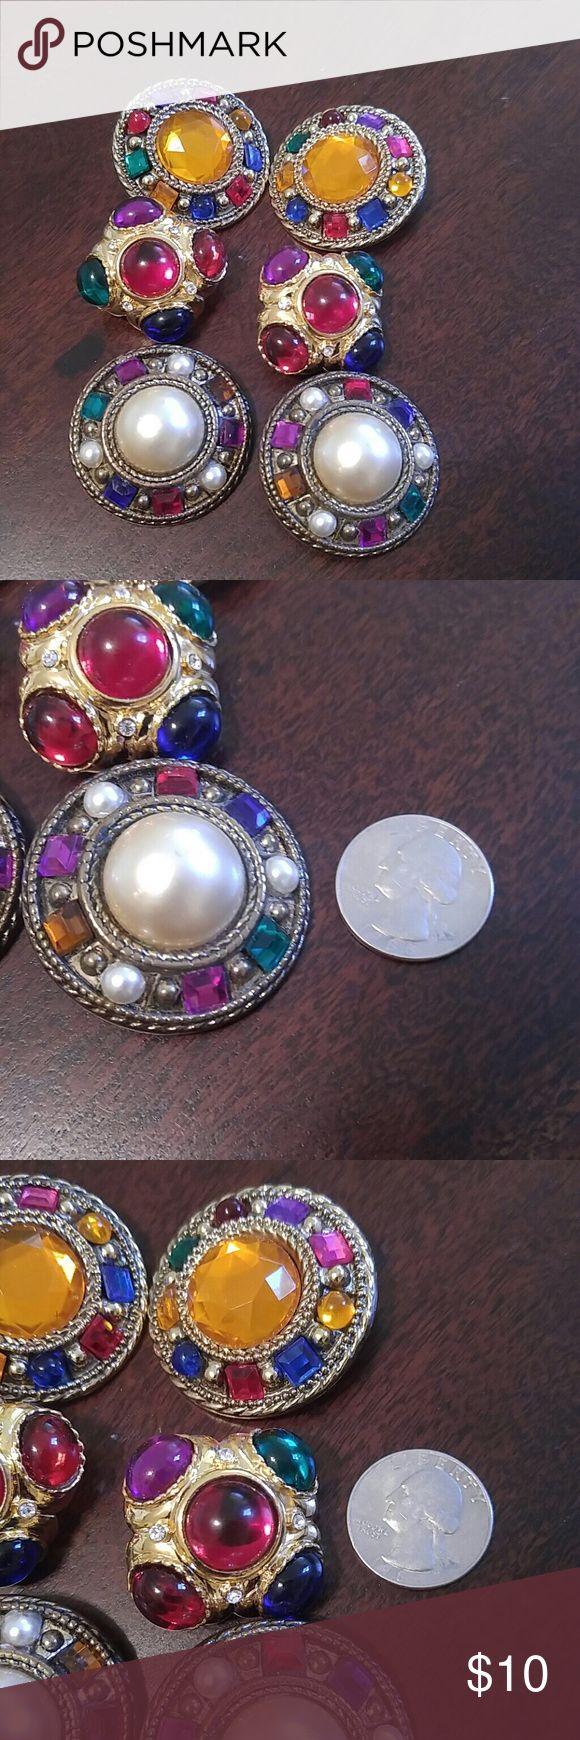 Vintage Earring Lot.  3 Pairs of 80s Earrings Vintage Earring Lot.  3 Pairs of 80s Earrings. Clip on backings. Very Colorful...No Missing Stones. Gold Tone Metal. Vintage Jewelry Earrings